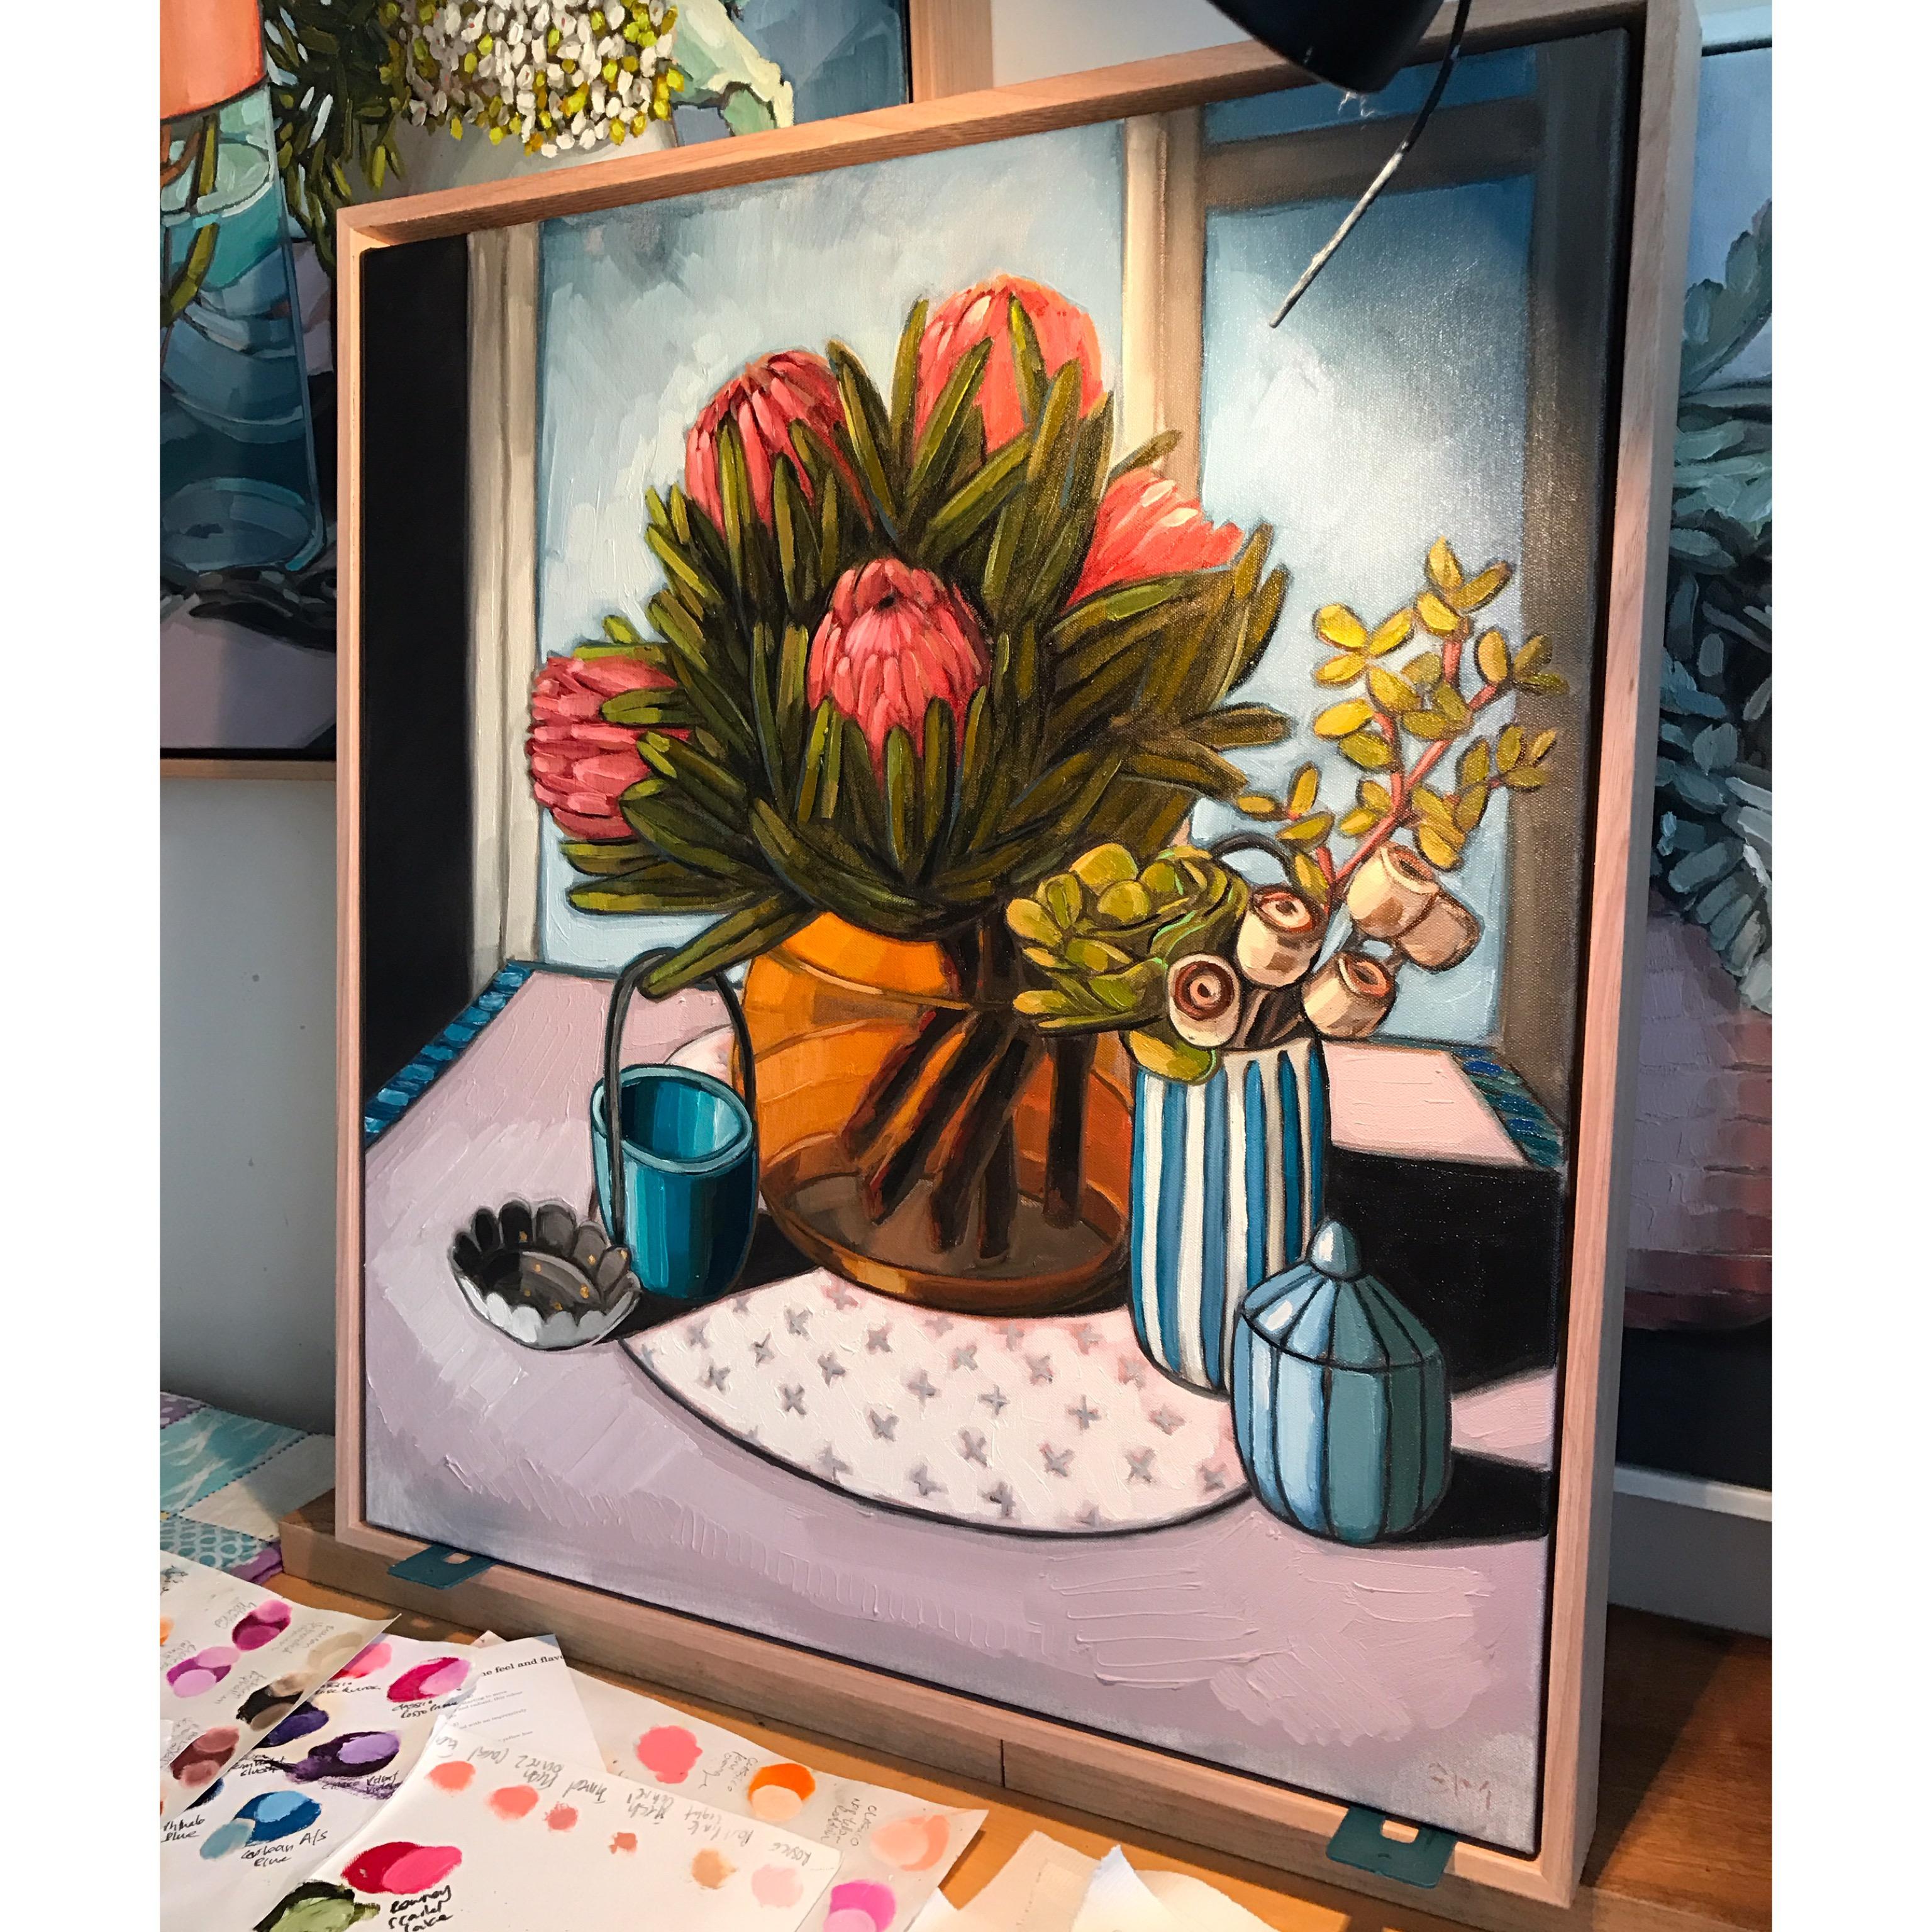 04_17 Protea Still Life 56x62cm $1,095